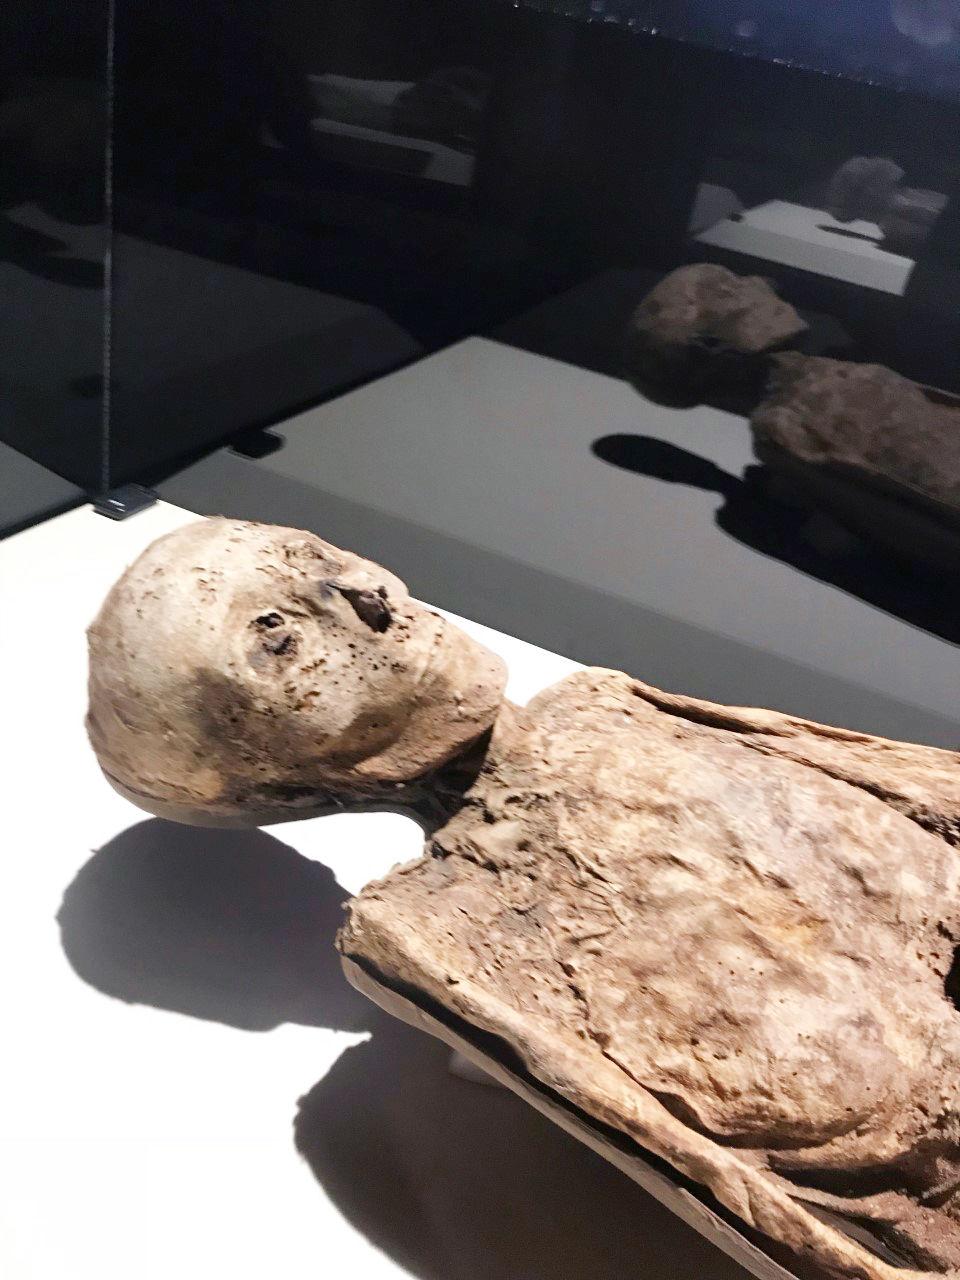 20191022_com_mummies2.jpg